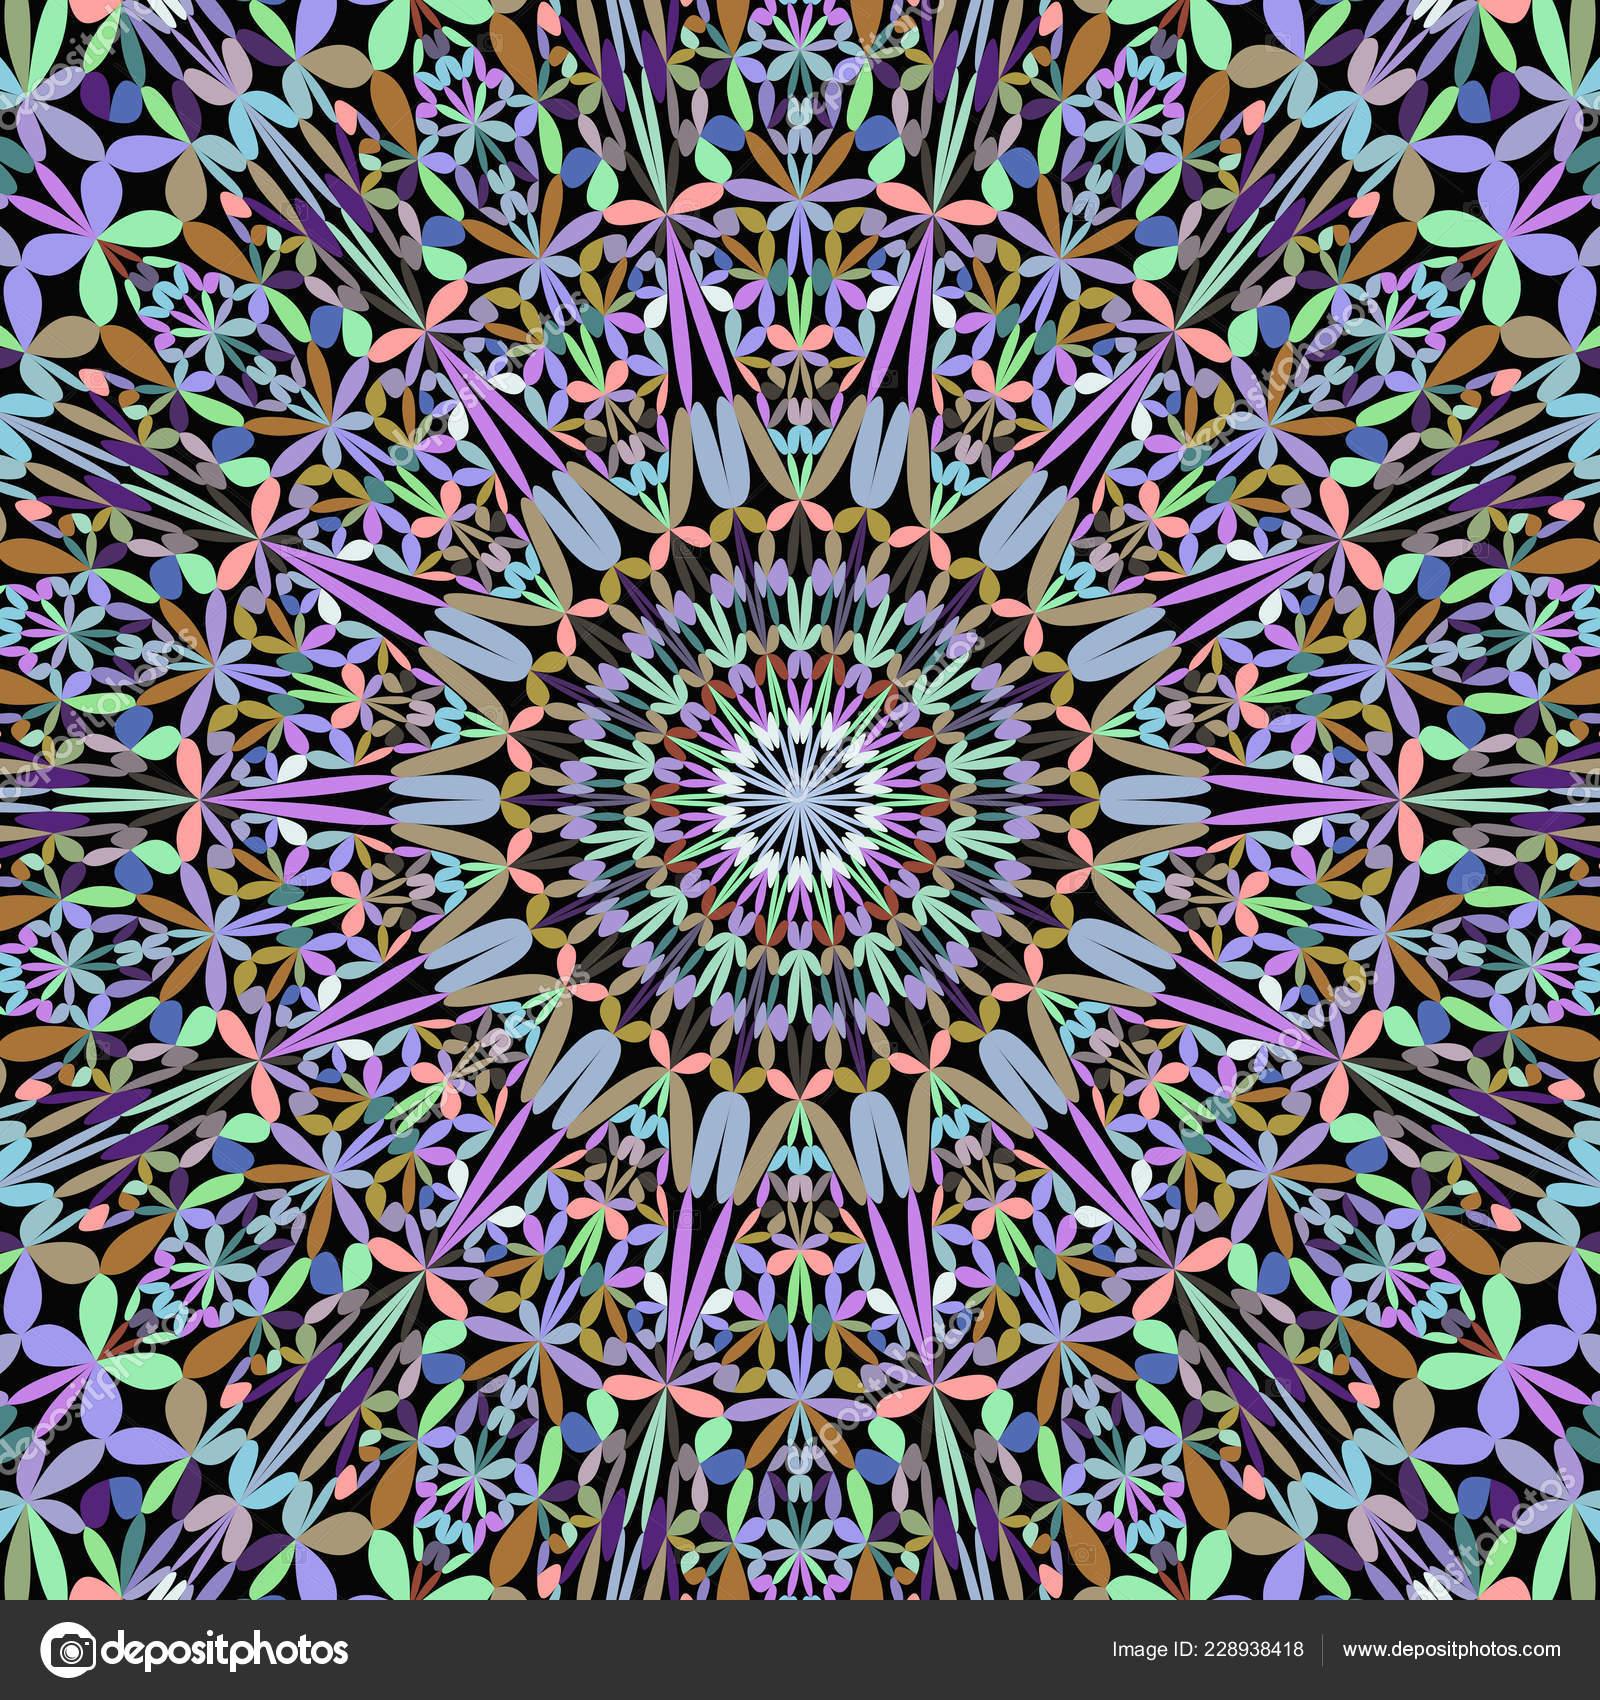 Colorful floral ornate mandala pattern